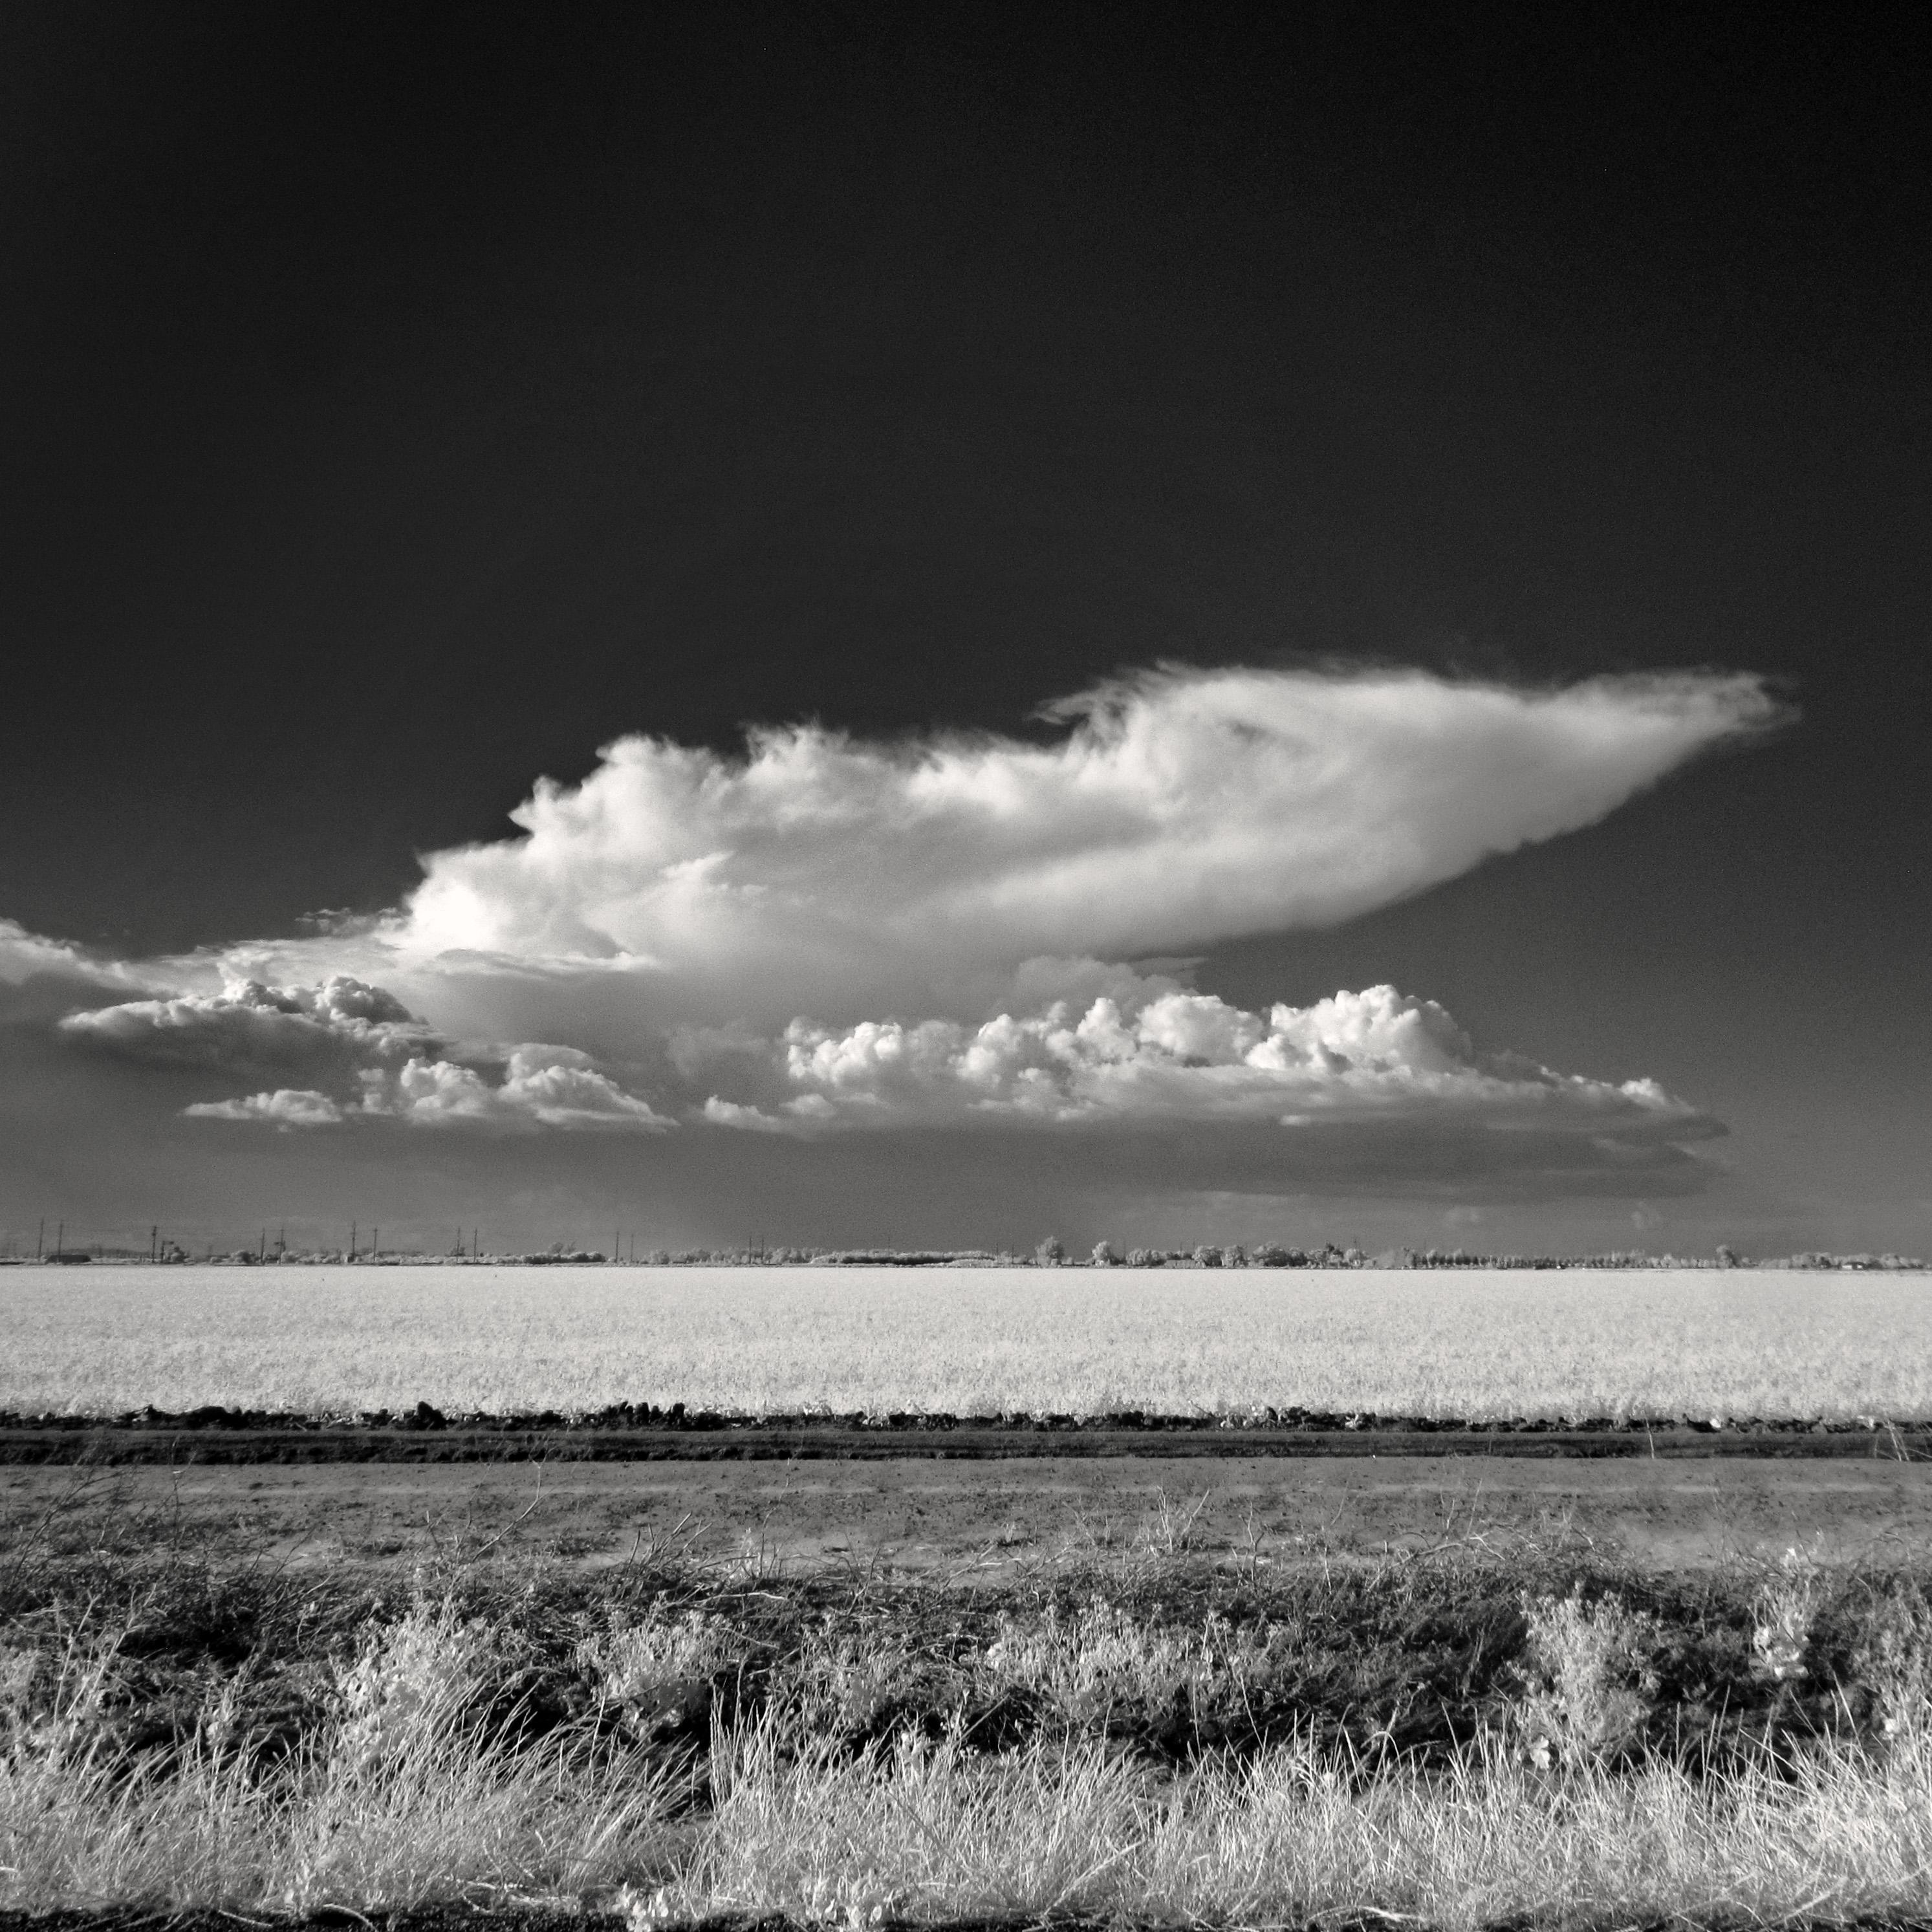 Небо и горизонт черно белое фото